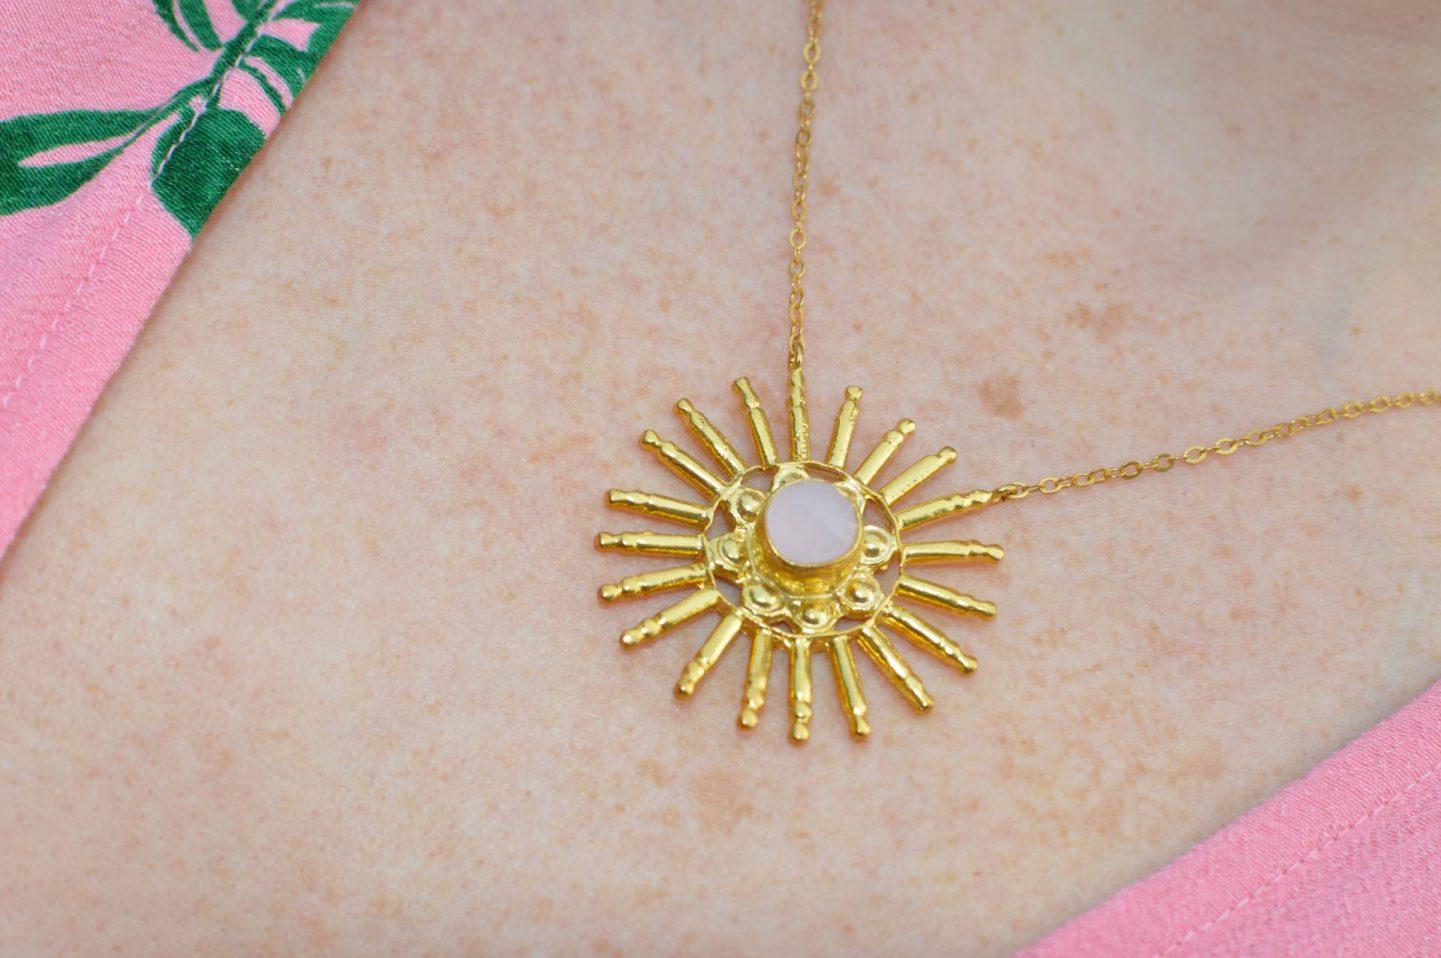 Ottoman Hands rose quartz and gold necklace